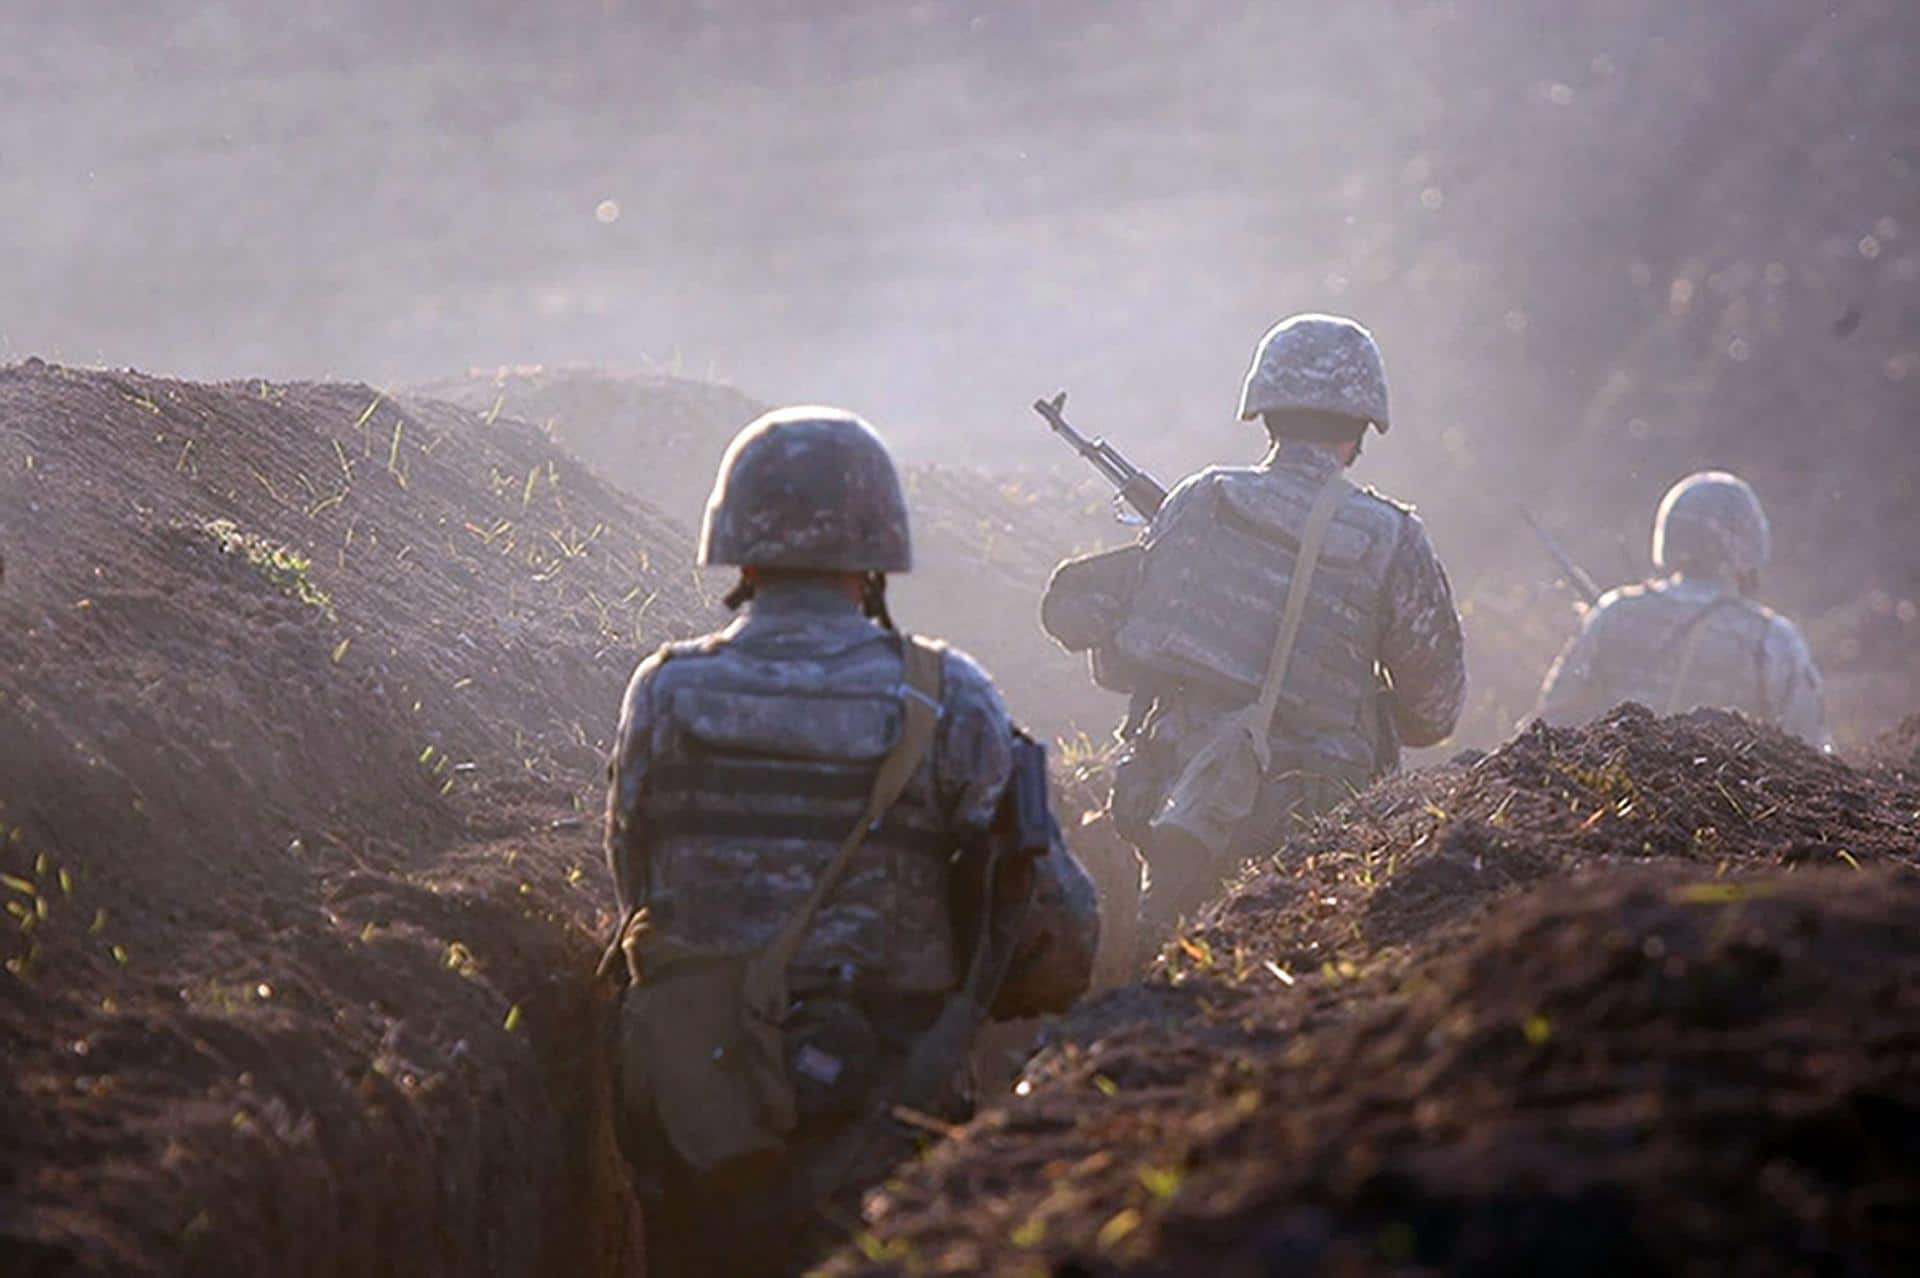 أذربيجان - مقاتلين سوريين